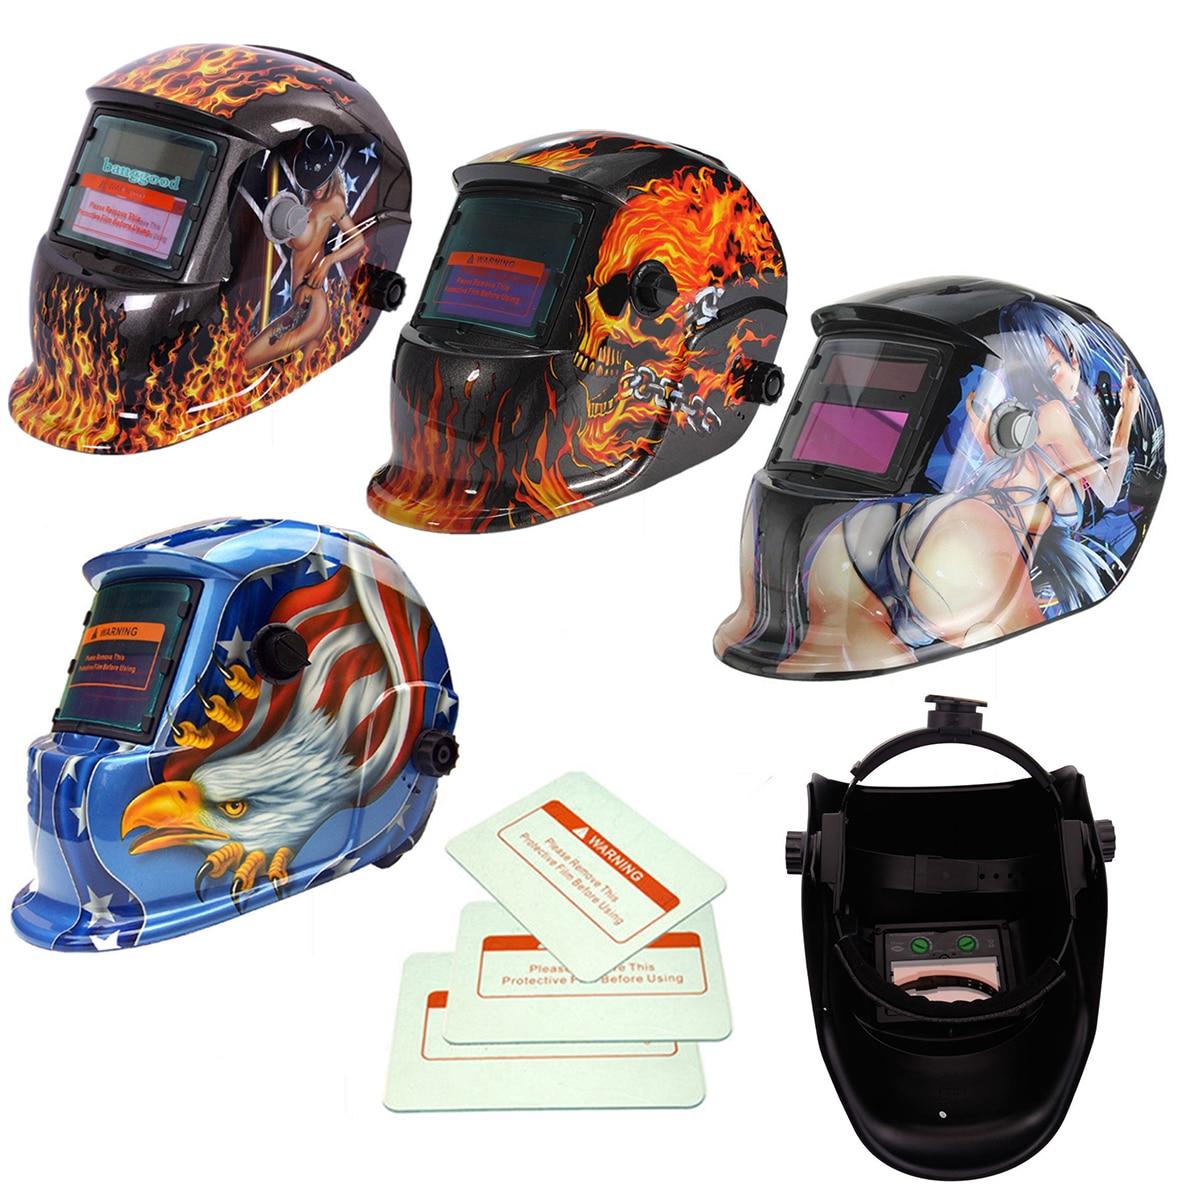 Ossieao New Solar Auto Darkening Welding Helmet + 3 Lens Tig Mask Grinding Welder Mask areyourshop solar auto darkening welding helmet arc tig mig grinding welder mask 1pcs blue good quality for welding machine